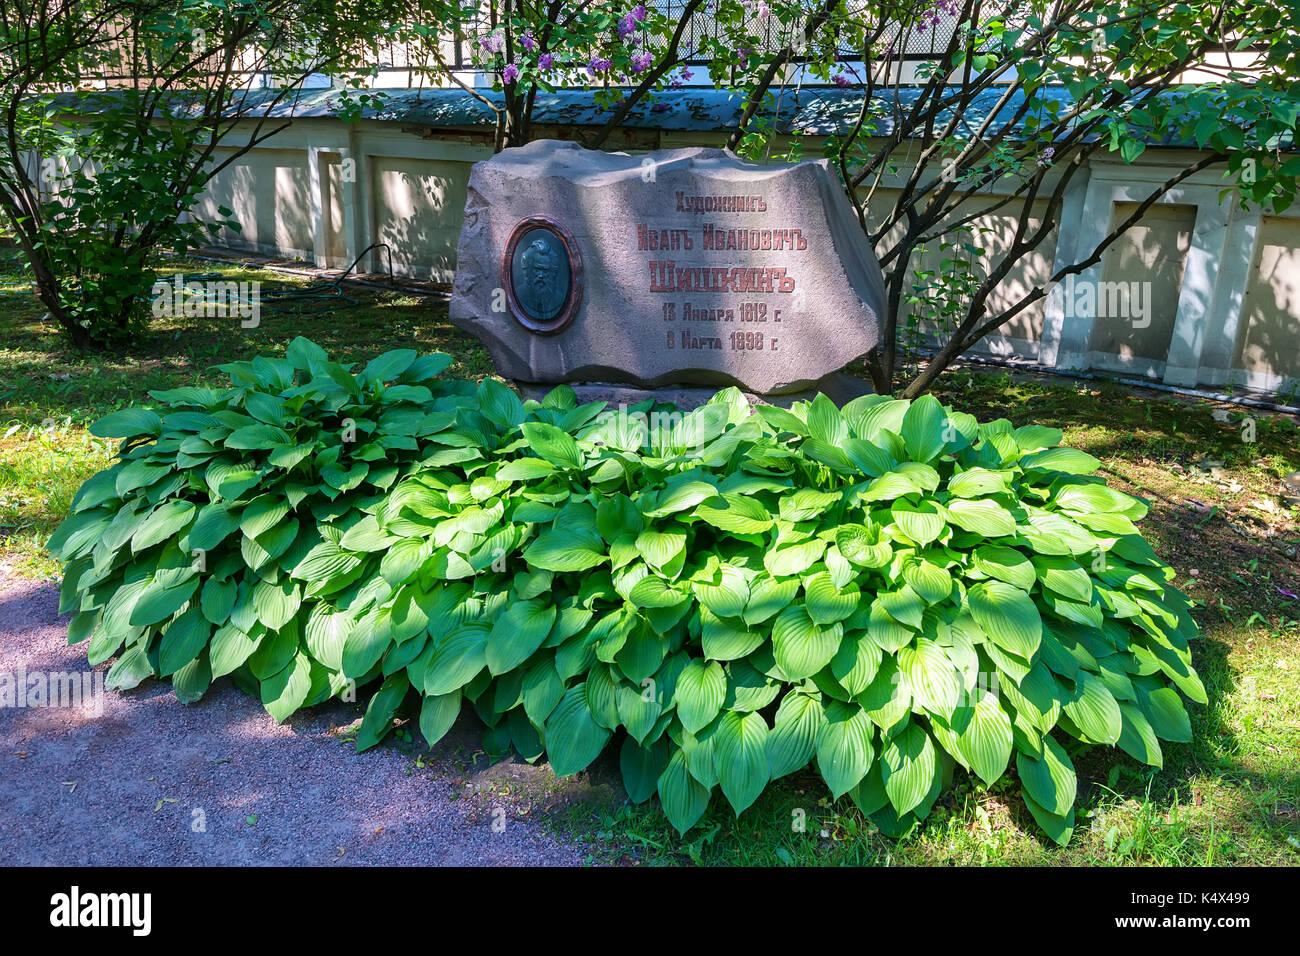 ST.PETERSBURG, RUSSIA - JUNE, 2015: SHISHKIN GRAVE - Stock Image